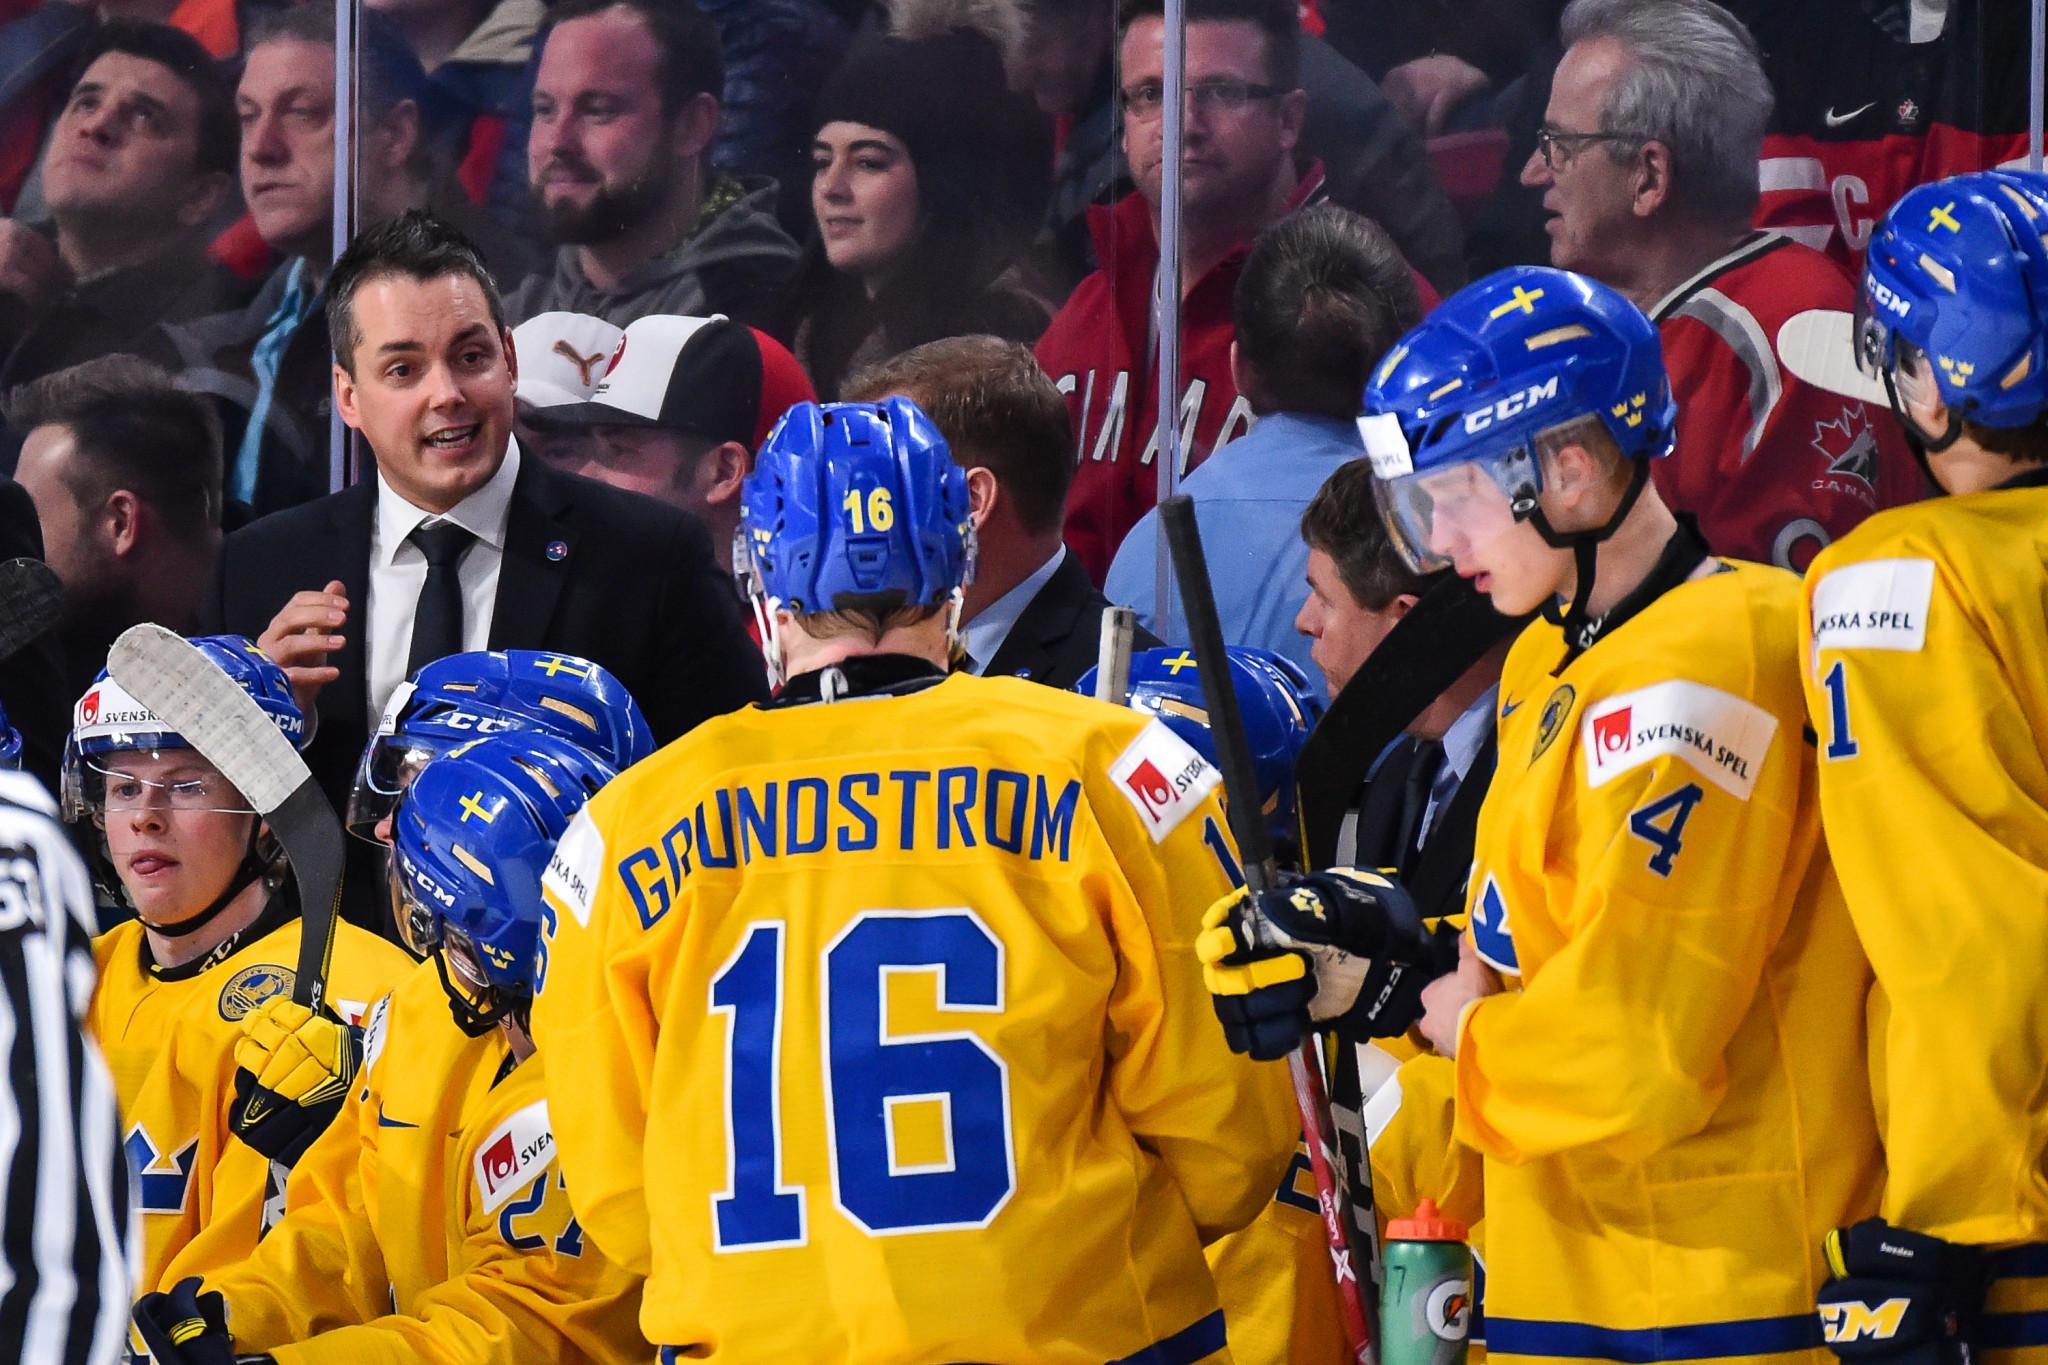 Tomas Montén, head coach of Sweden's junior team, was unable to travel to Edmonton after contracting coronavirus ©Getty Images